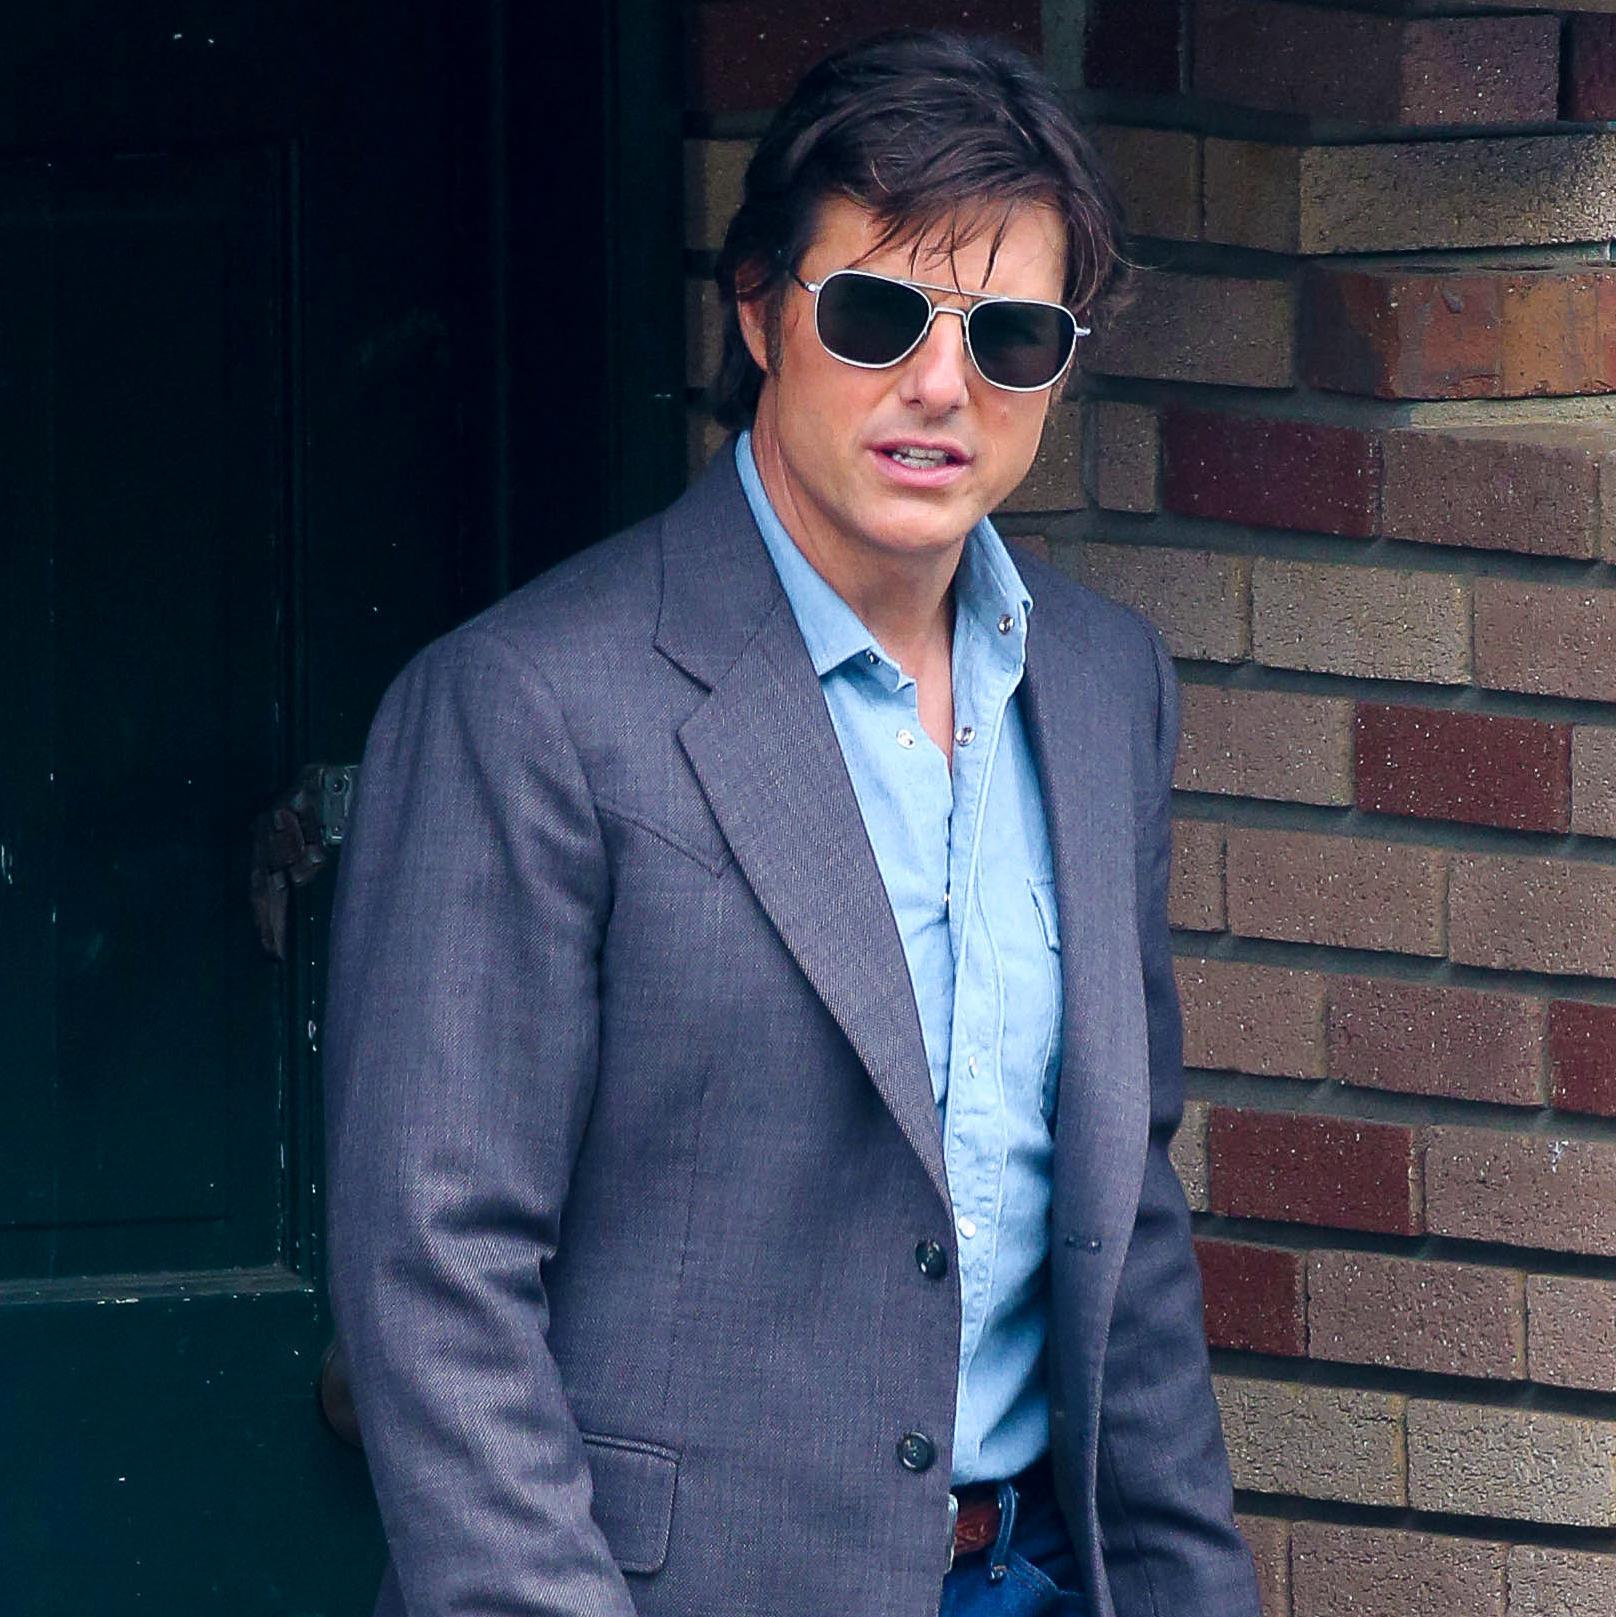 nouvelle nike air max 95 - Tom Cruise - Sa bio et toutes ses news people - Elle